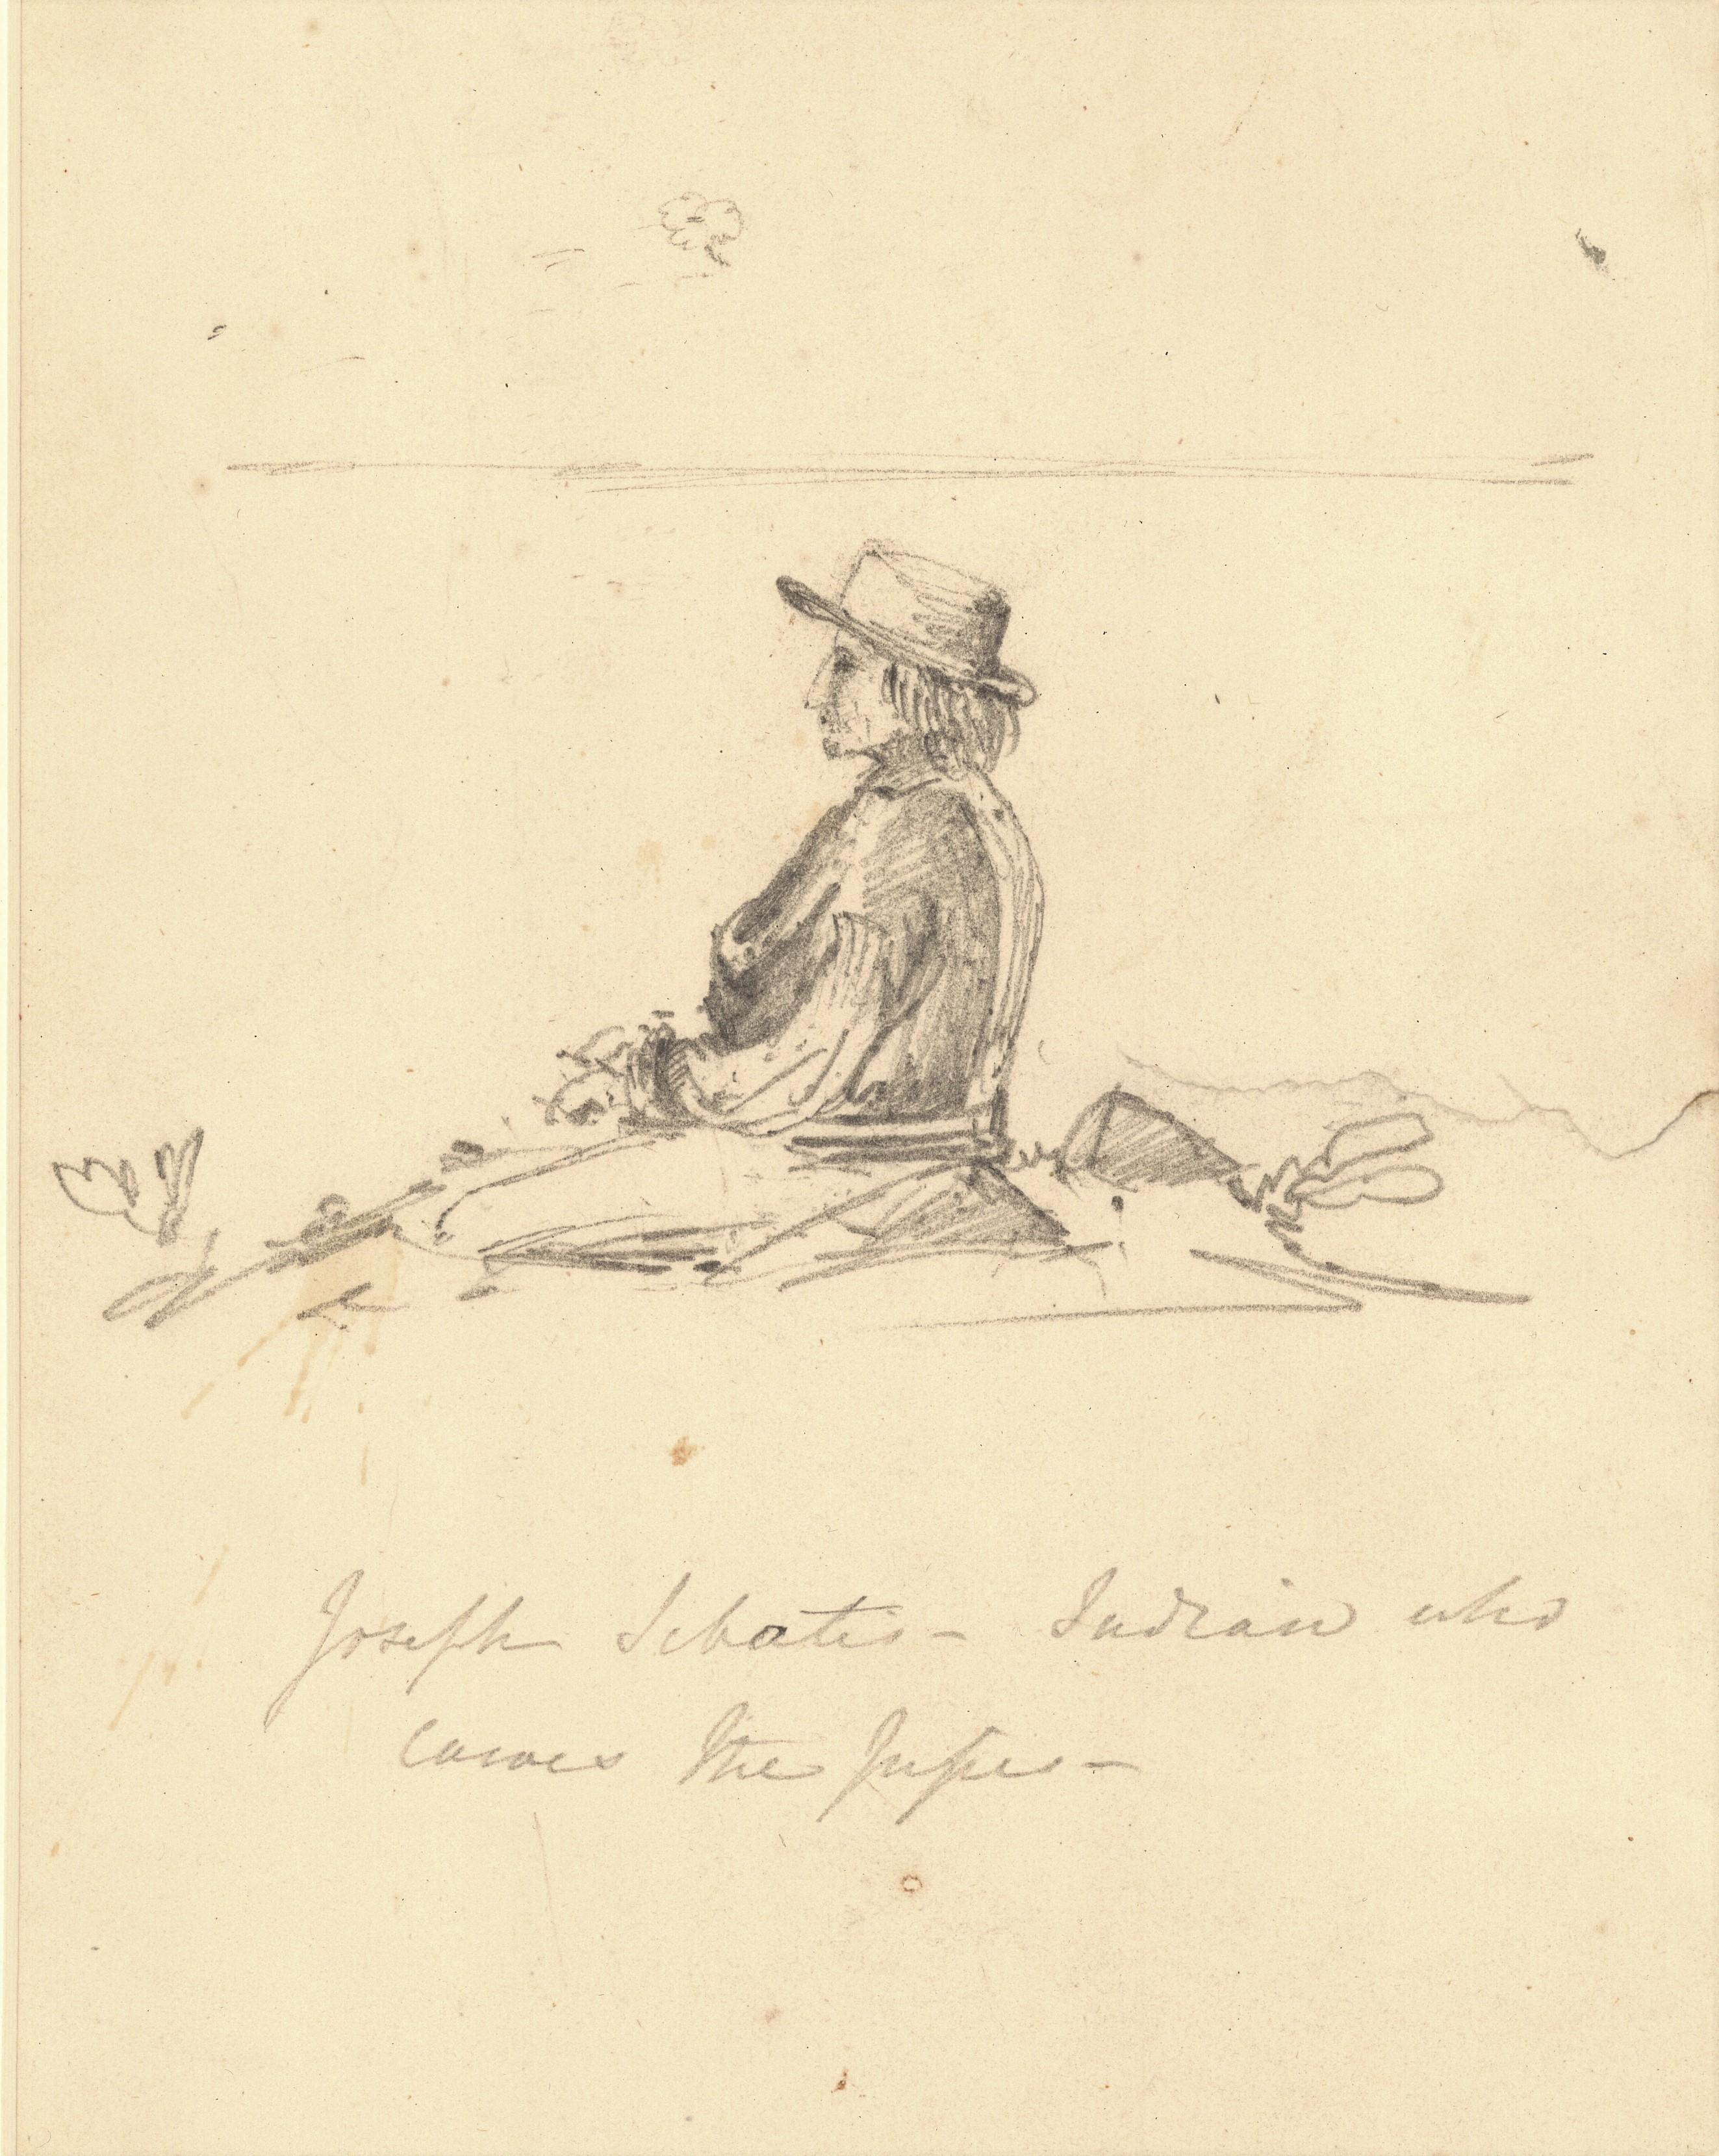 Joseph Sebatis - Indian Who Carves the Pipes_1848_PANB MC4225-MS1-3